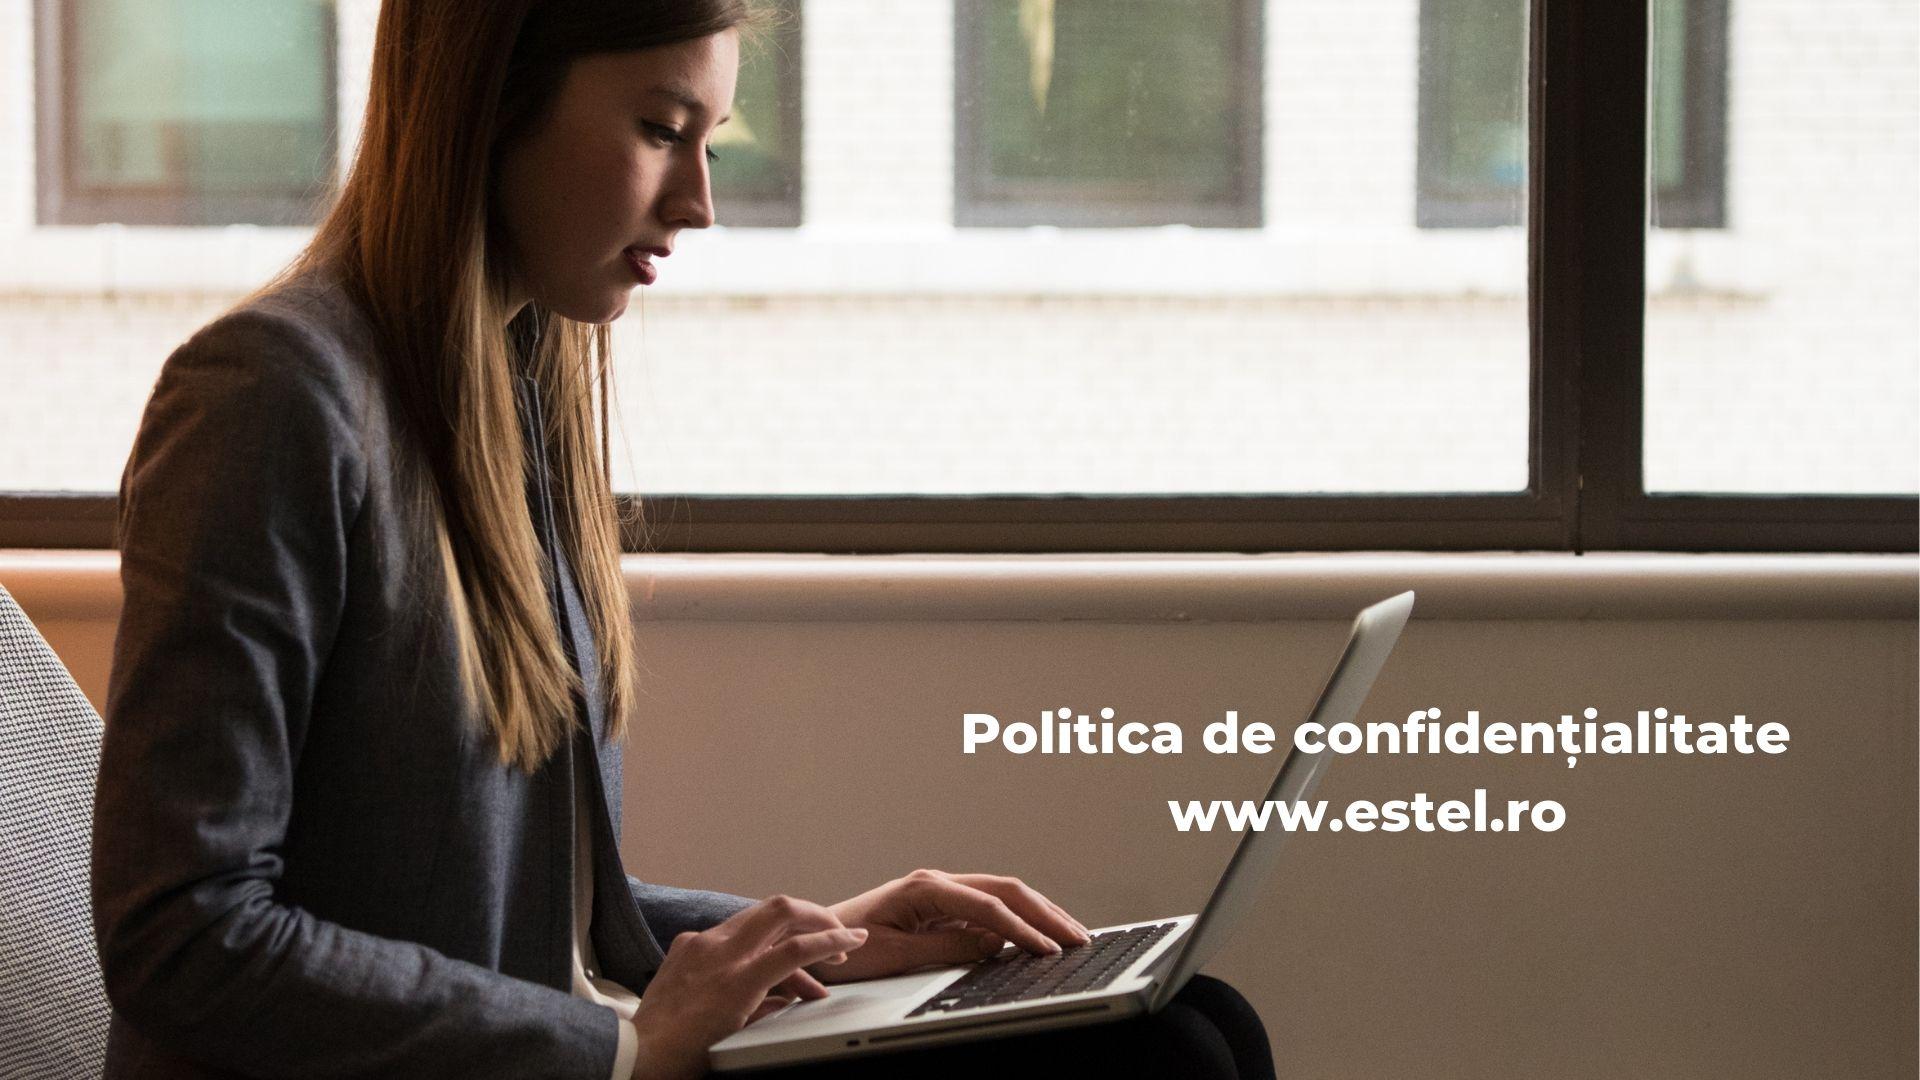 Politica de confidentialitate